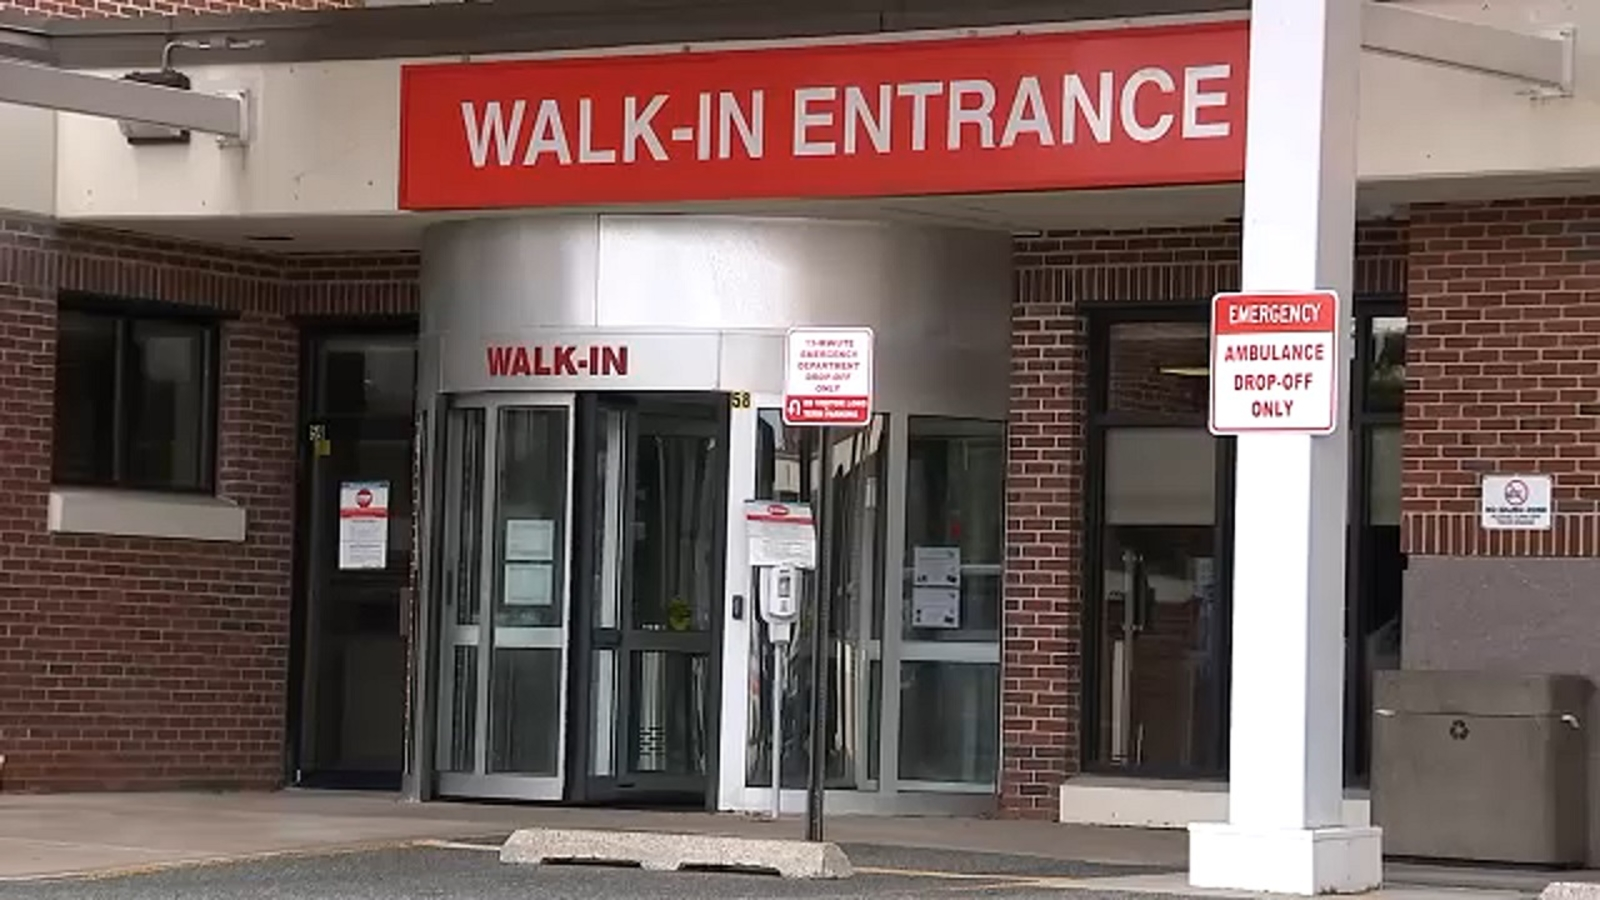 Suit claims NJ nurses gave patients Benadryl to make them fall asleep, create less work - WABC-TV thumbnail